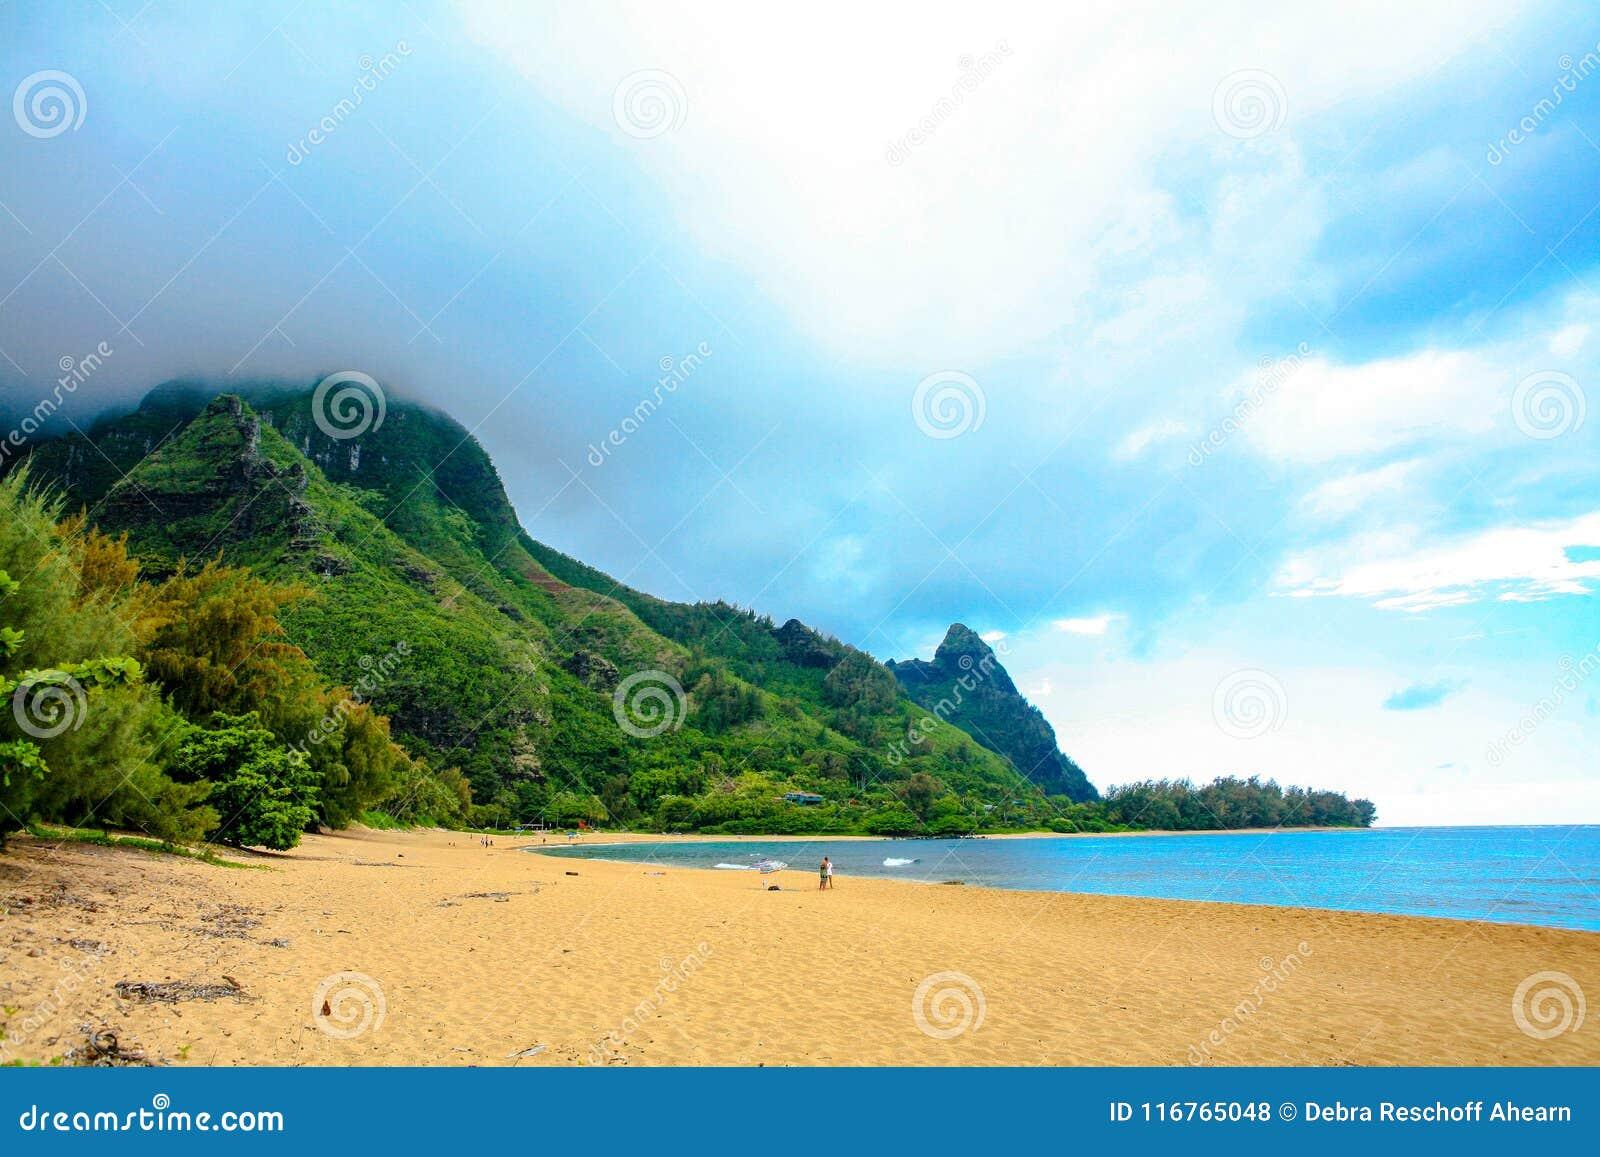 Where Is Bali Hai Island tunnels beach, with makana mountain or bali hai stock photo